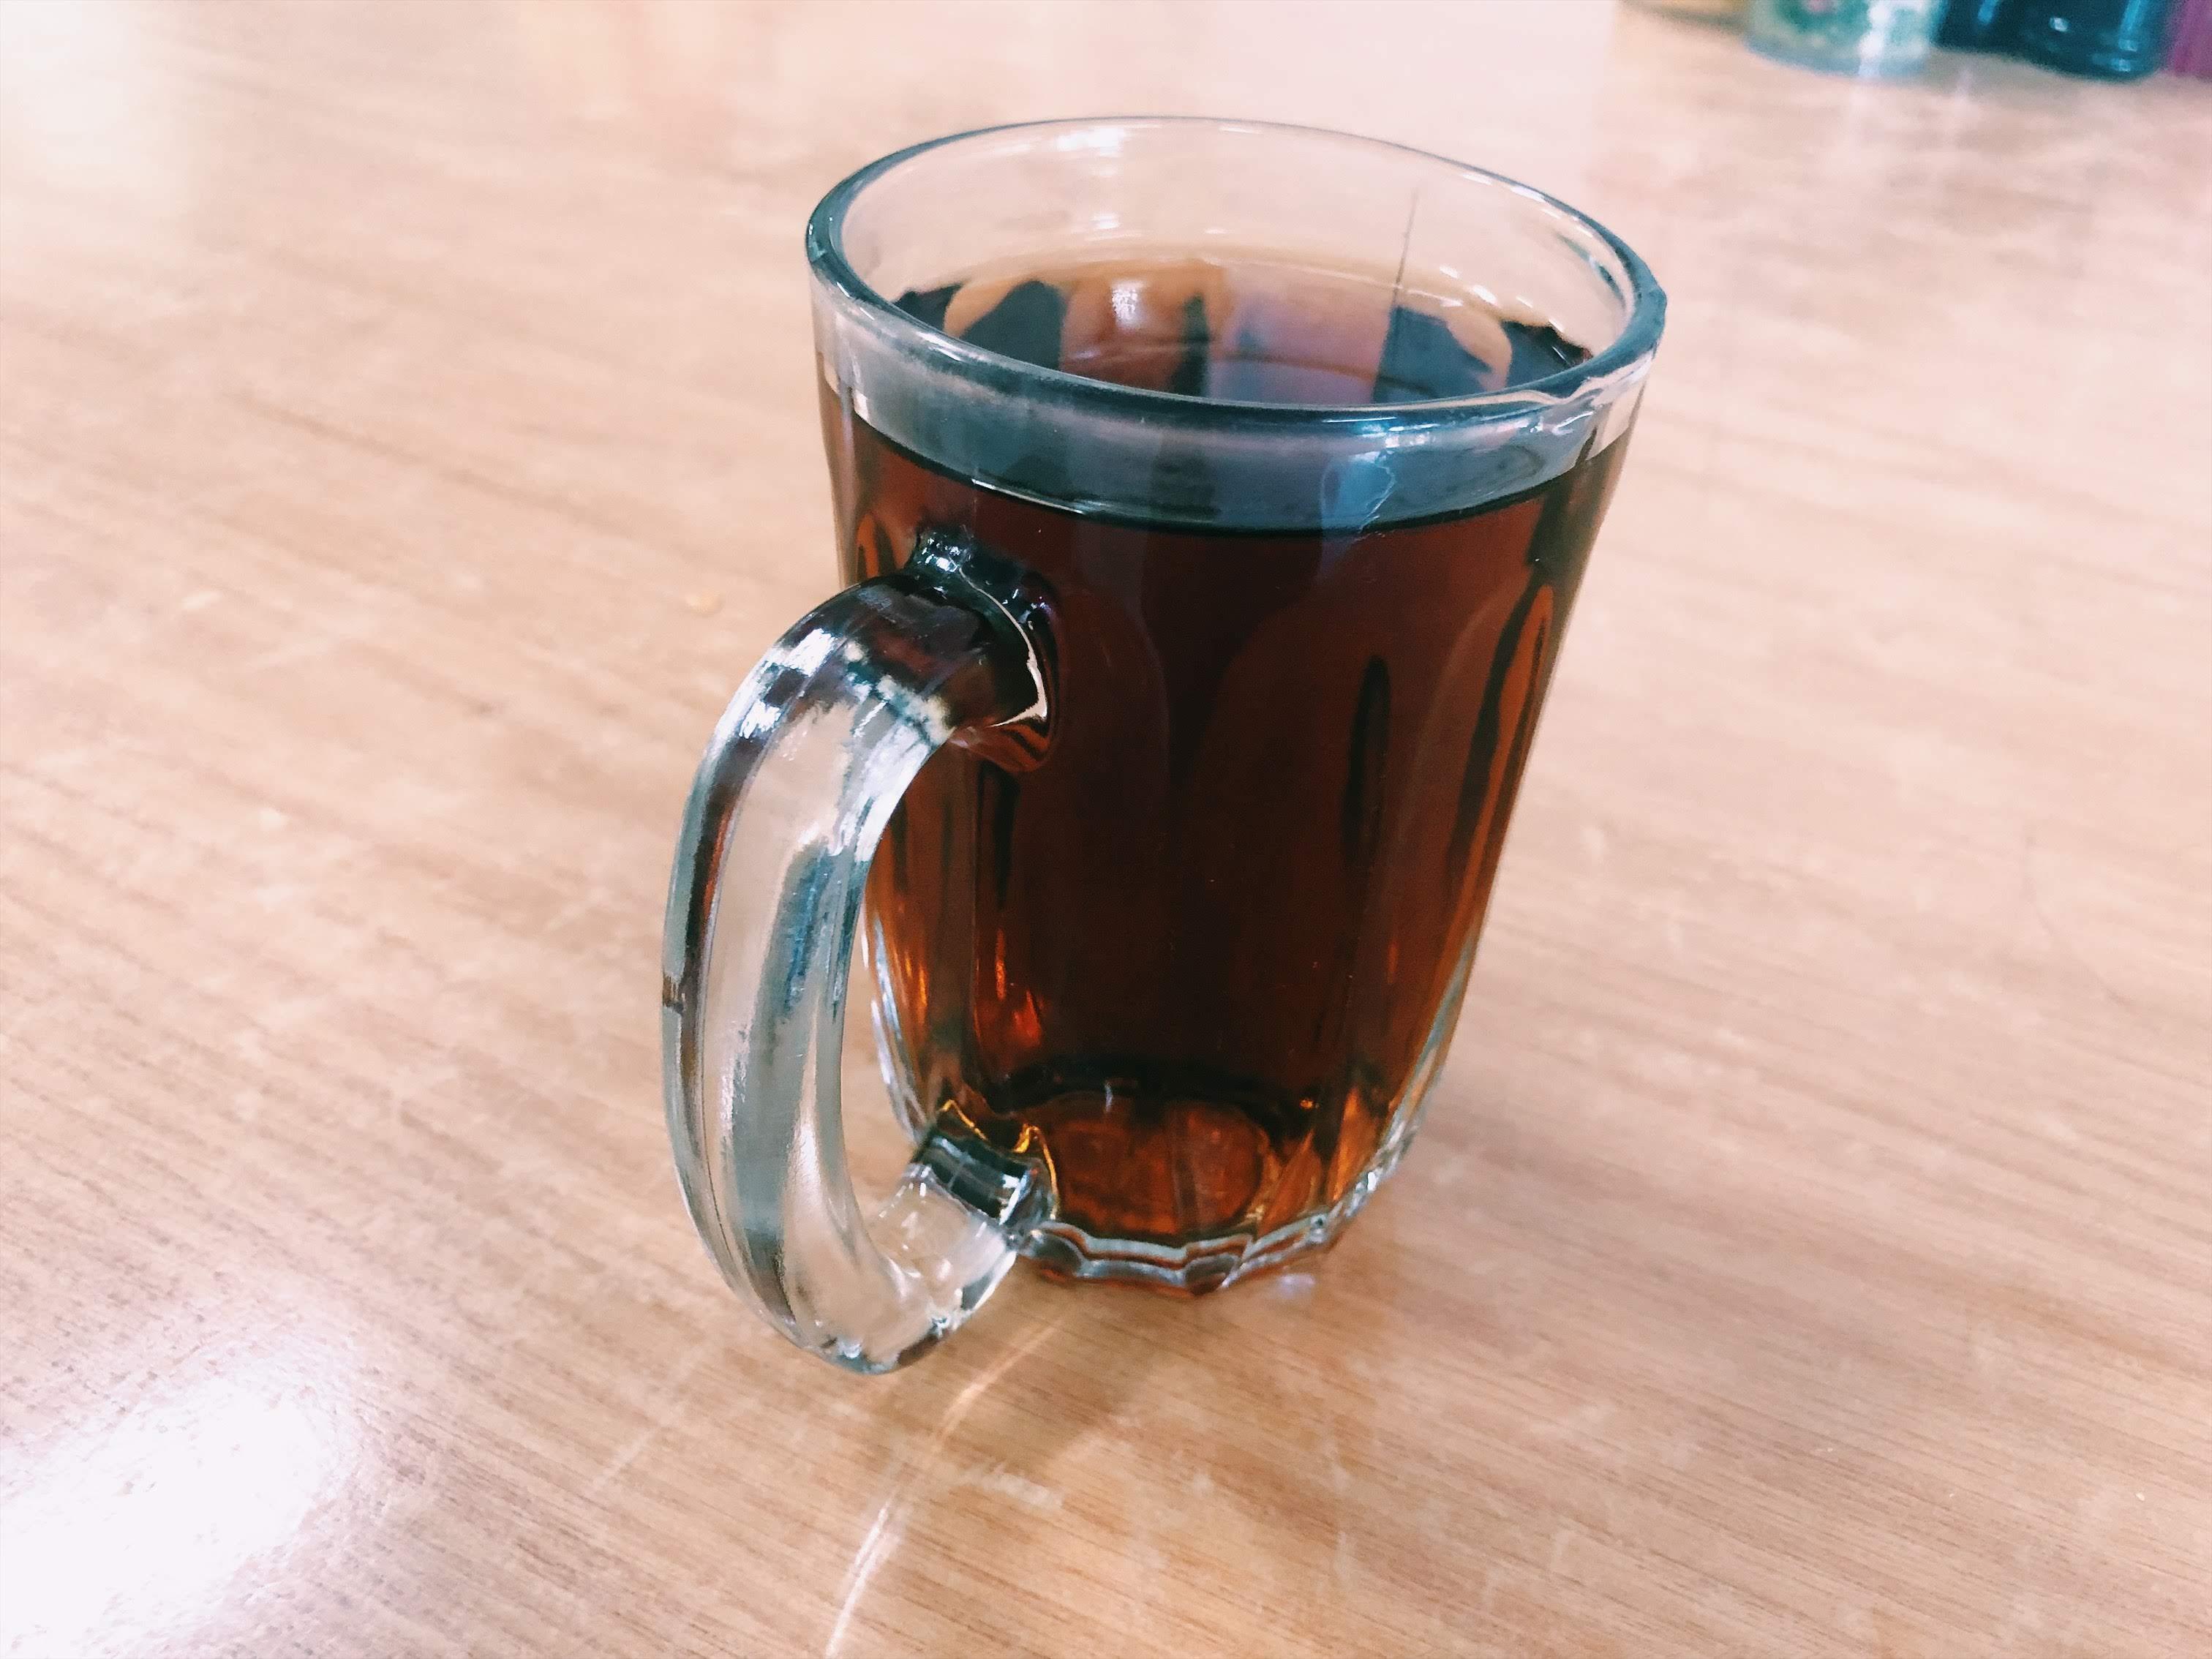 "Malaysia_BakKutTeh_Tea_015"""""